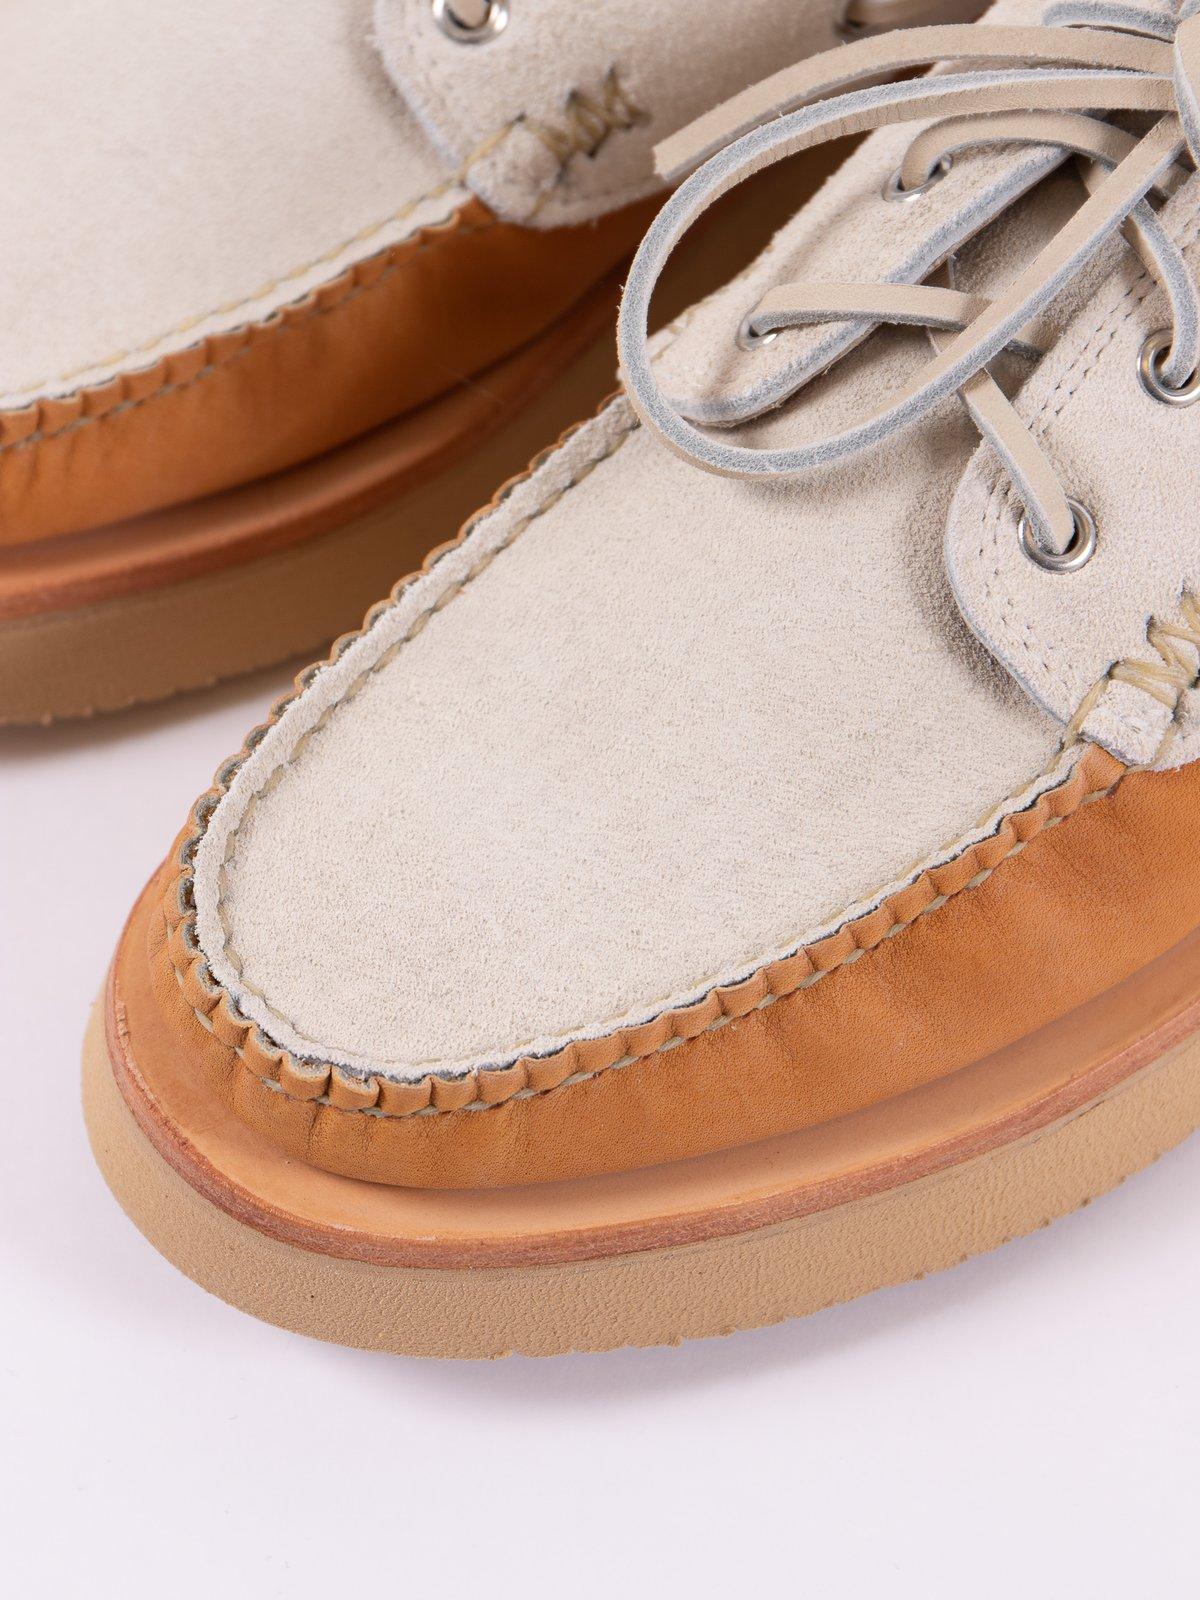 BB Tan/FO White Boat Shoe Exclusive - Image 3